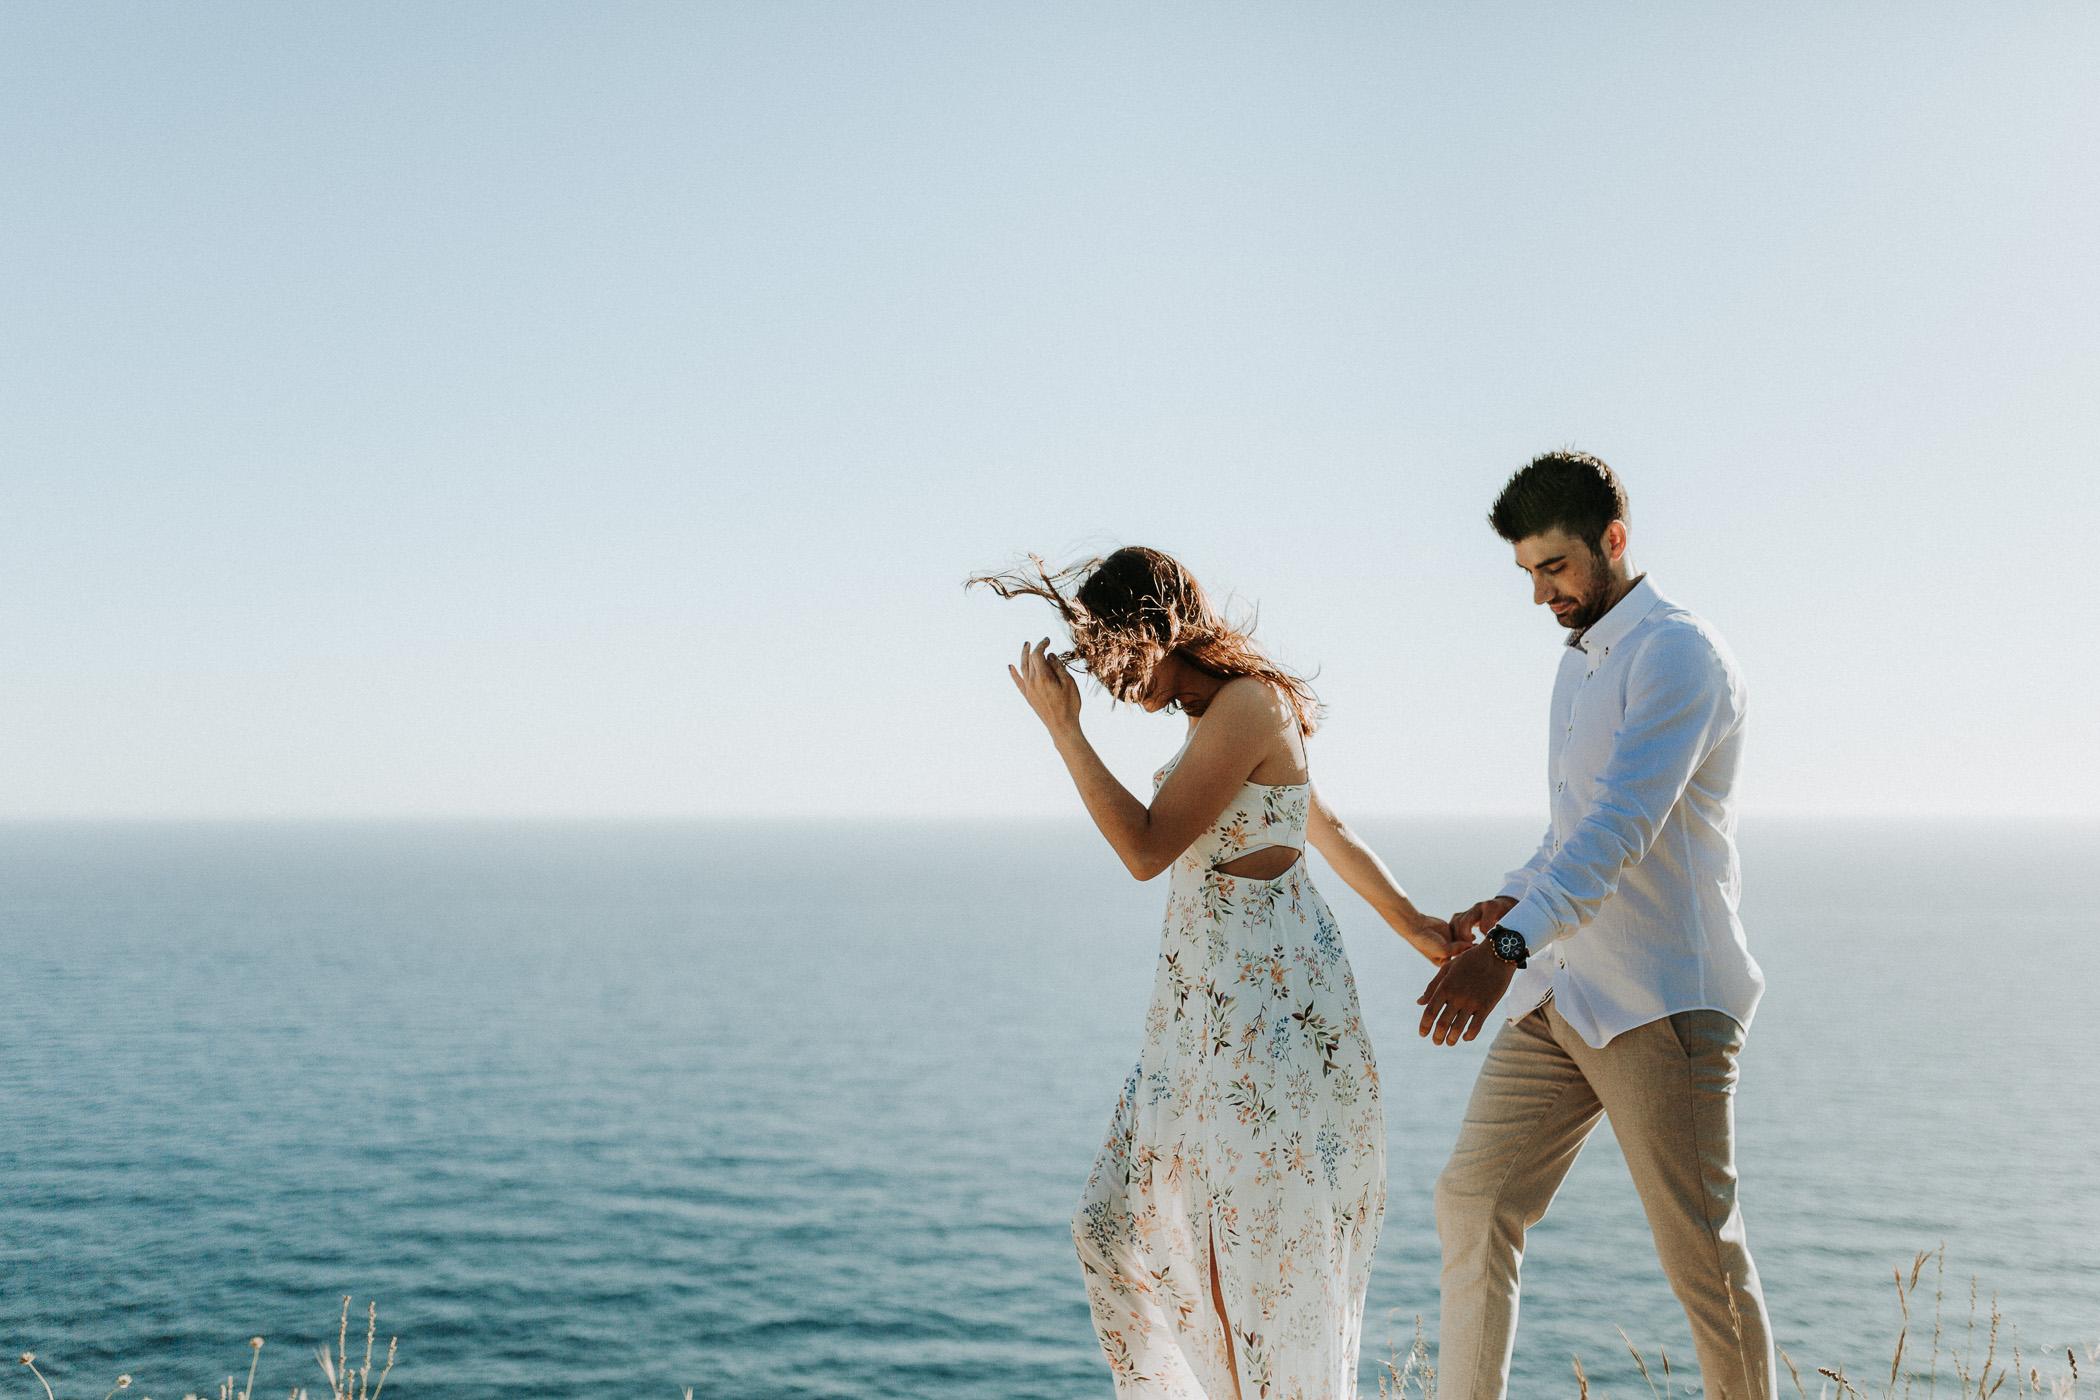 DanielaMarquardtPhotography_wedding_elopement_mallorca_spain_calapi_palma_lauraandtoni_292